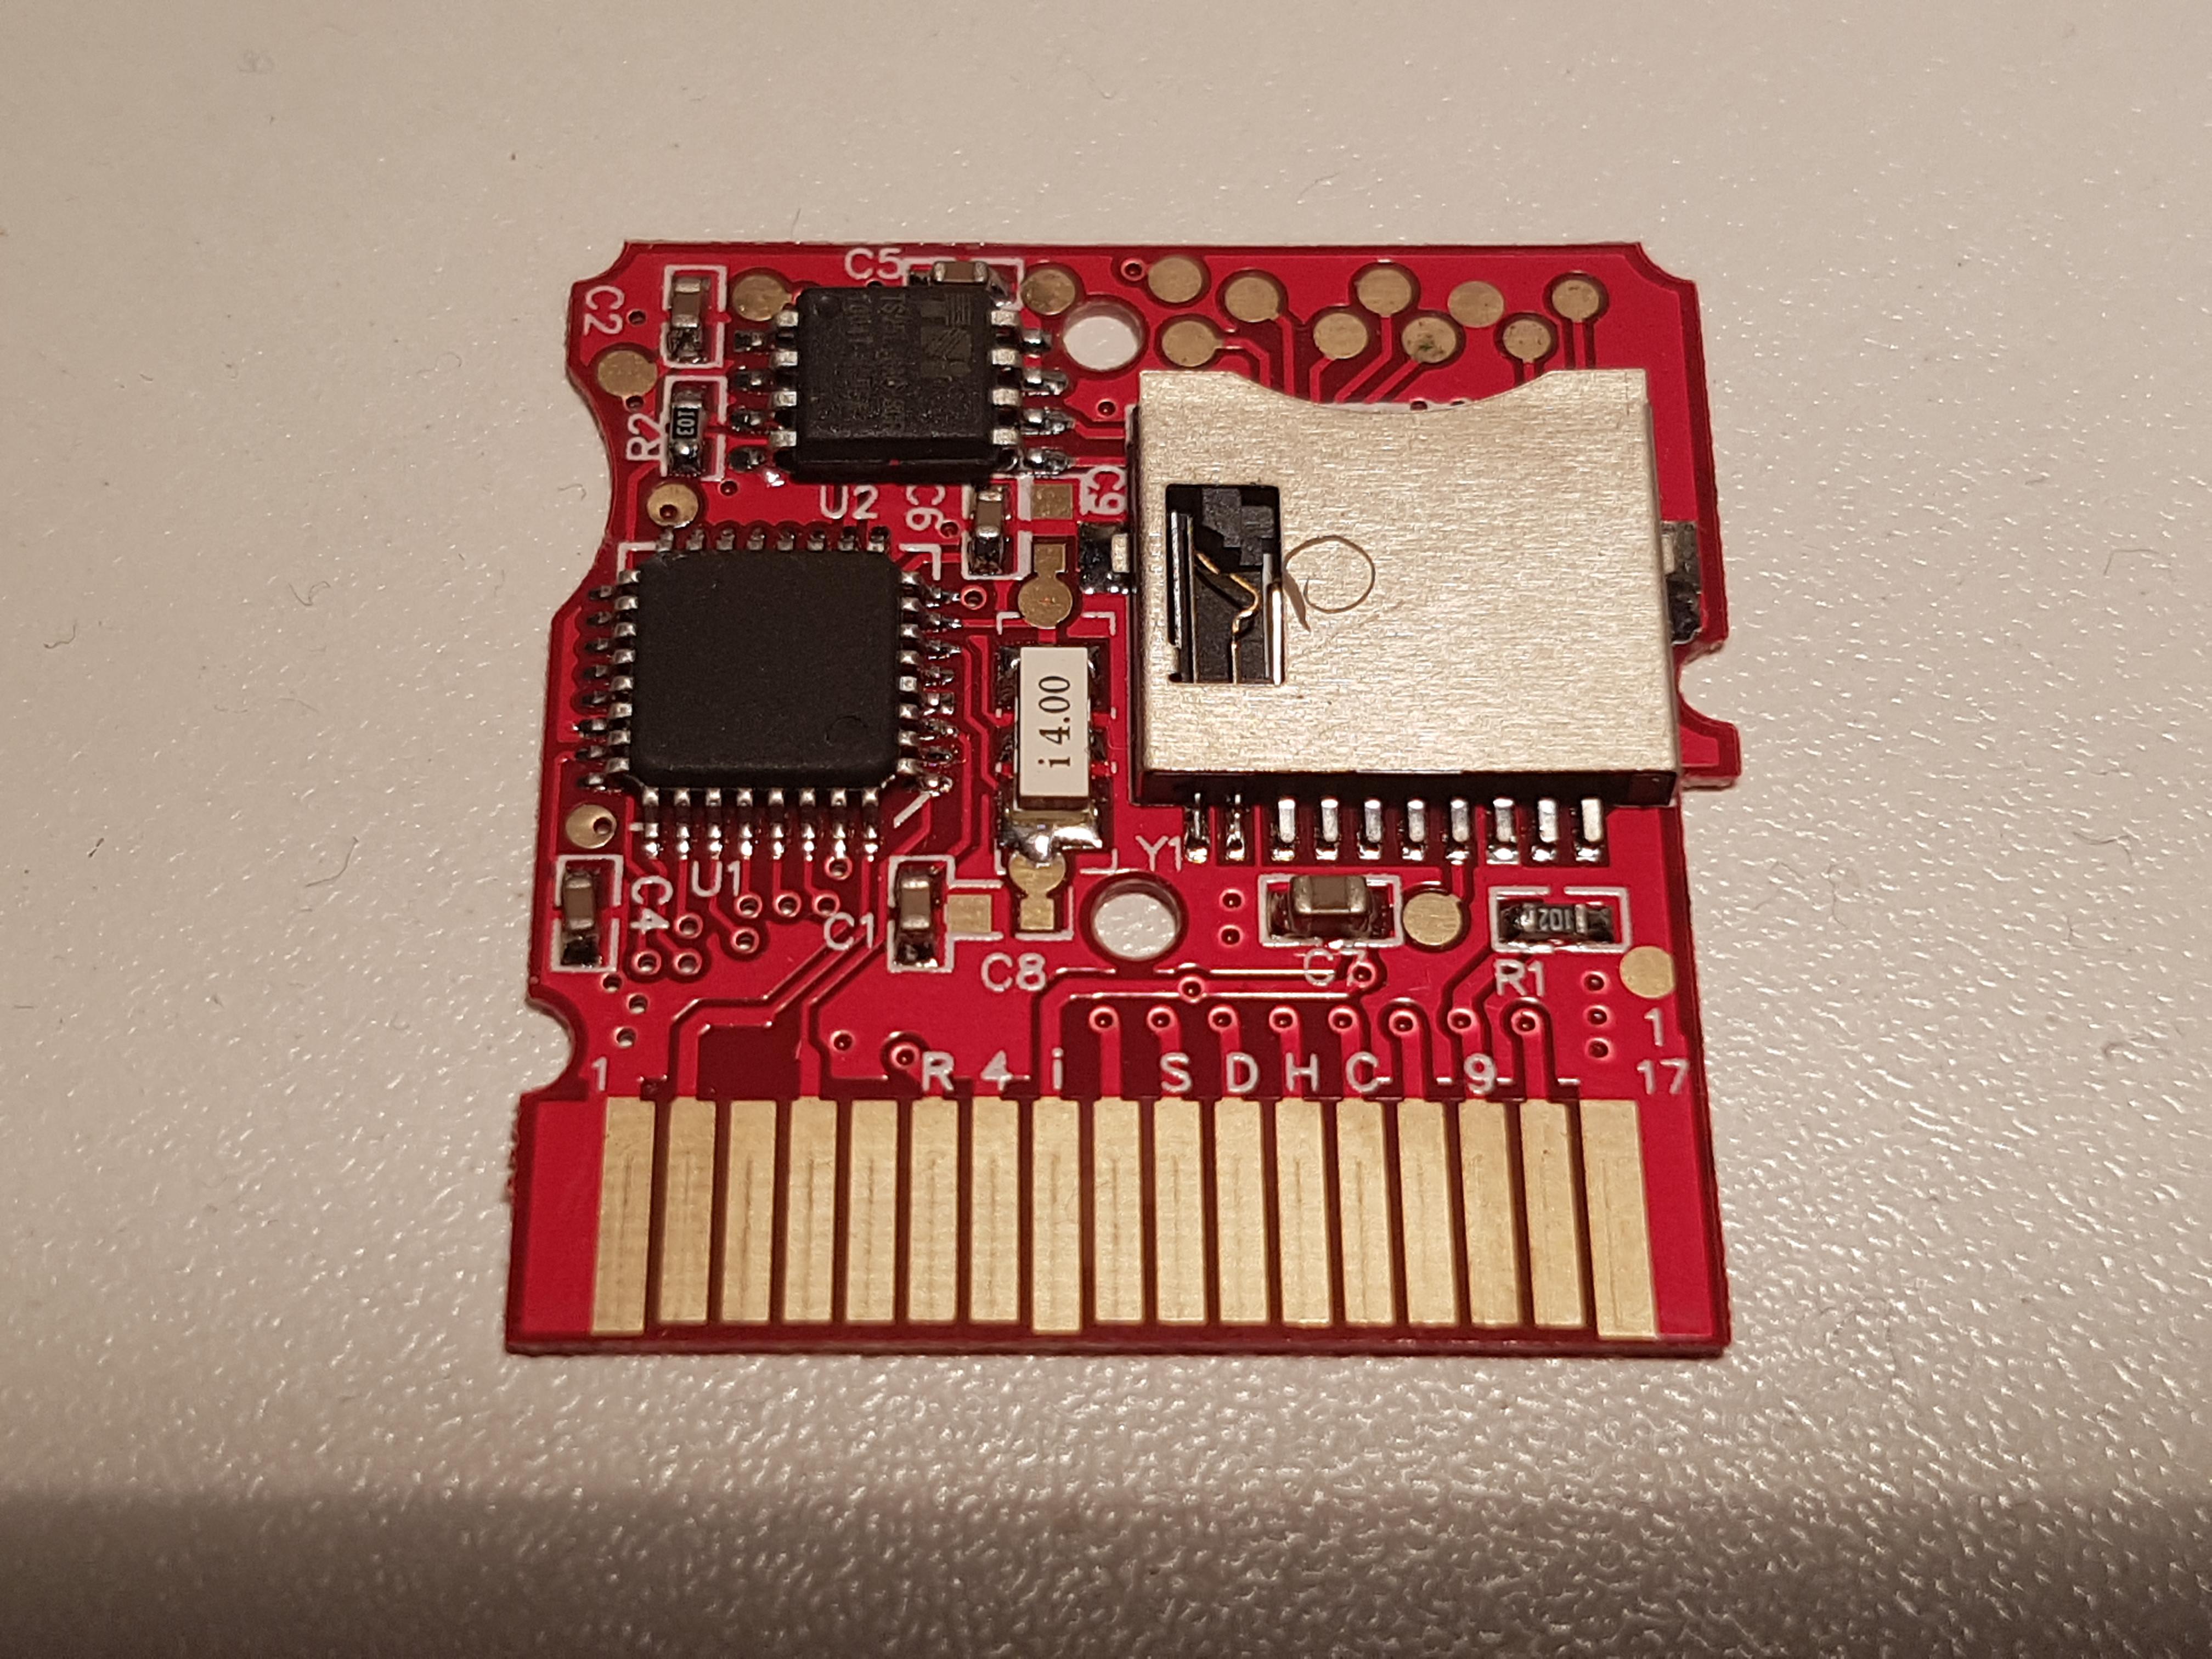 R4i SDHC HappyBox V2 0 card (www r4isdhc com) support